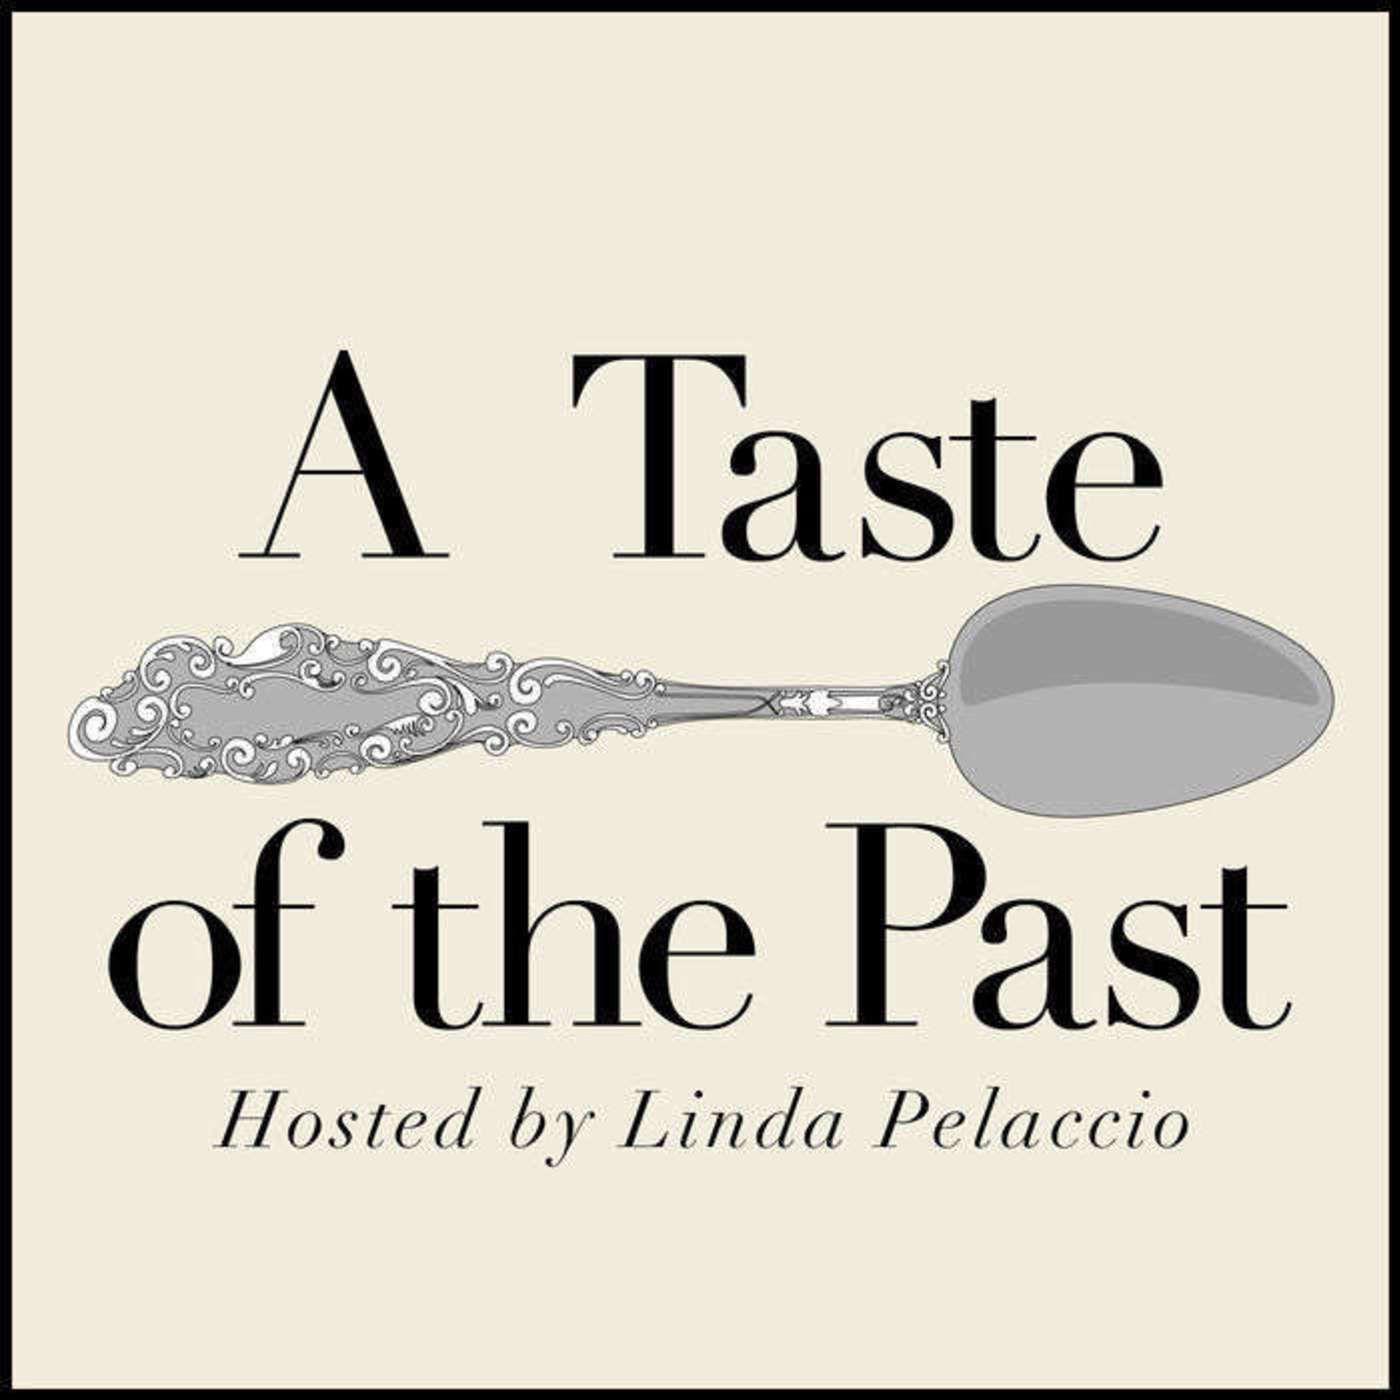 Episode 33: Eataly with Joe Bastianich & Lidia Bastianich